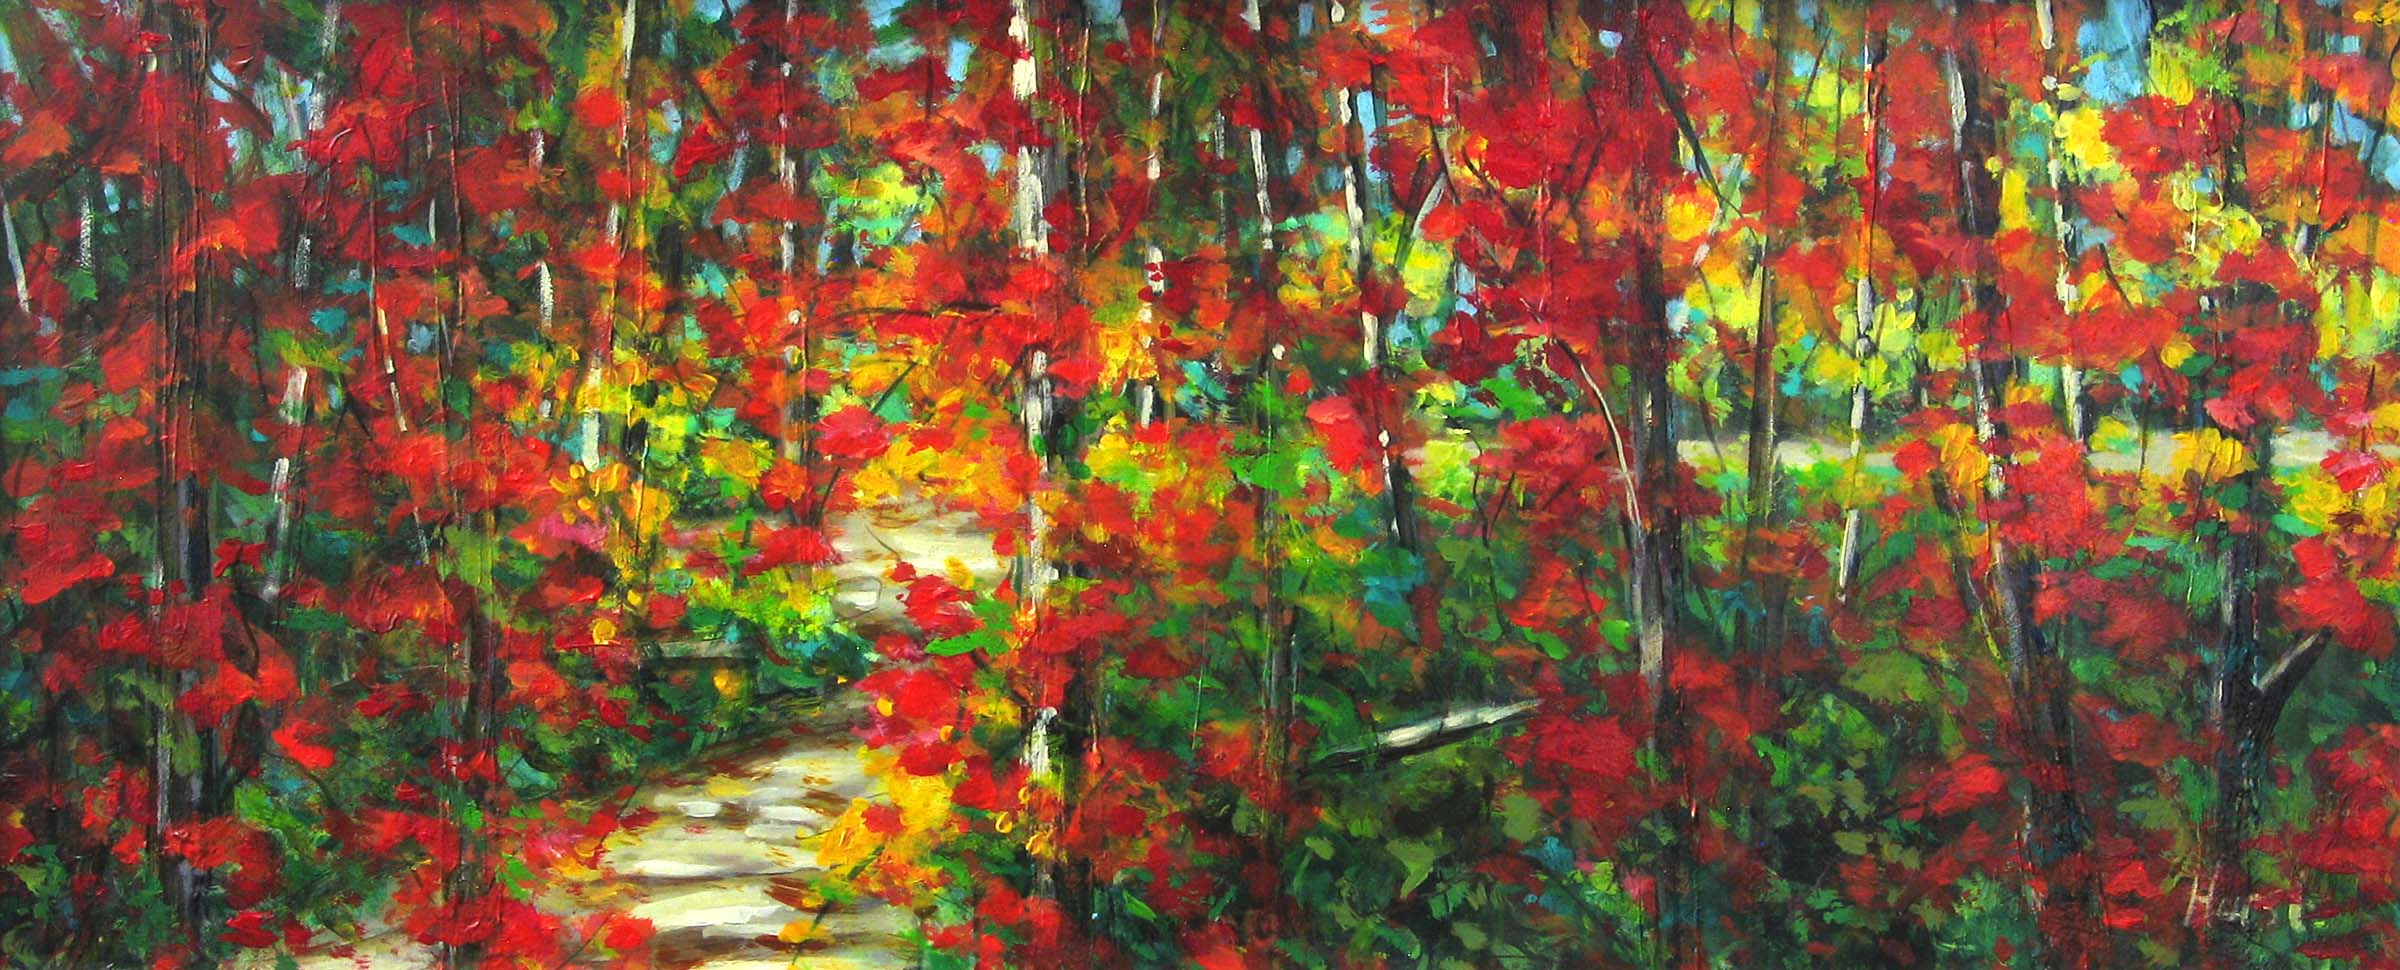 The Silent Path - Marilyn Hurst